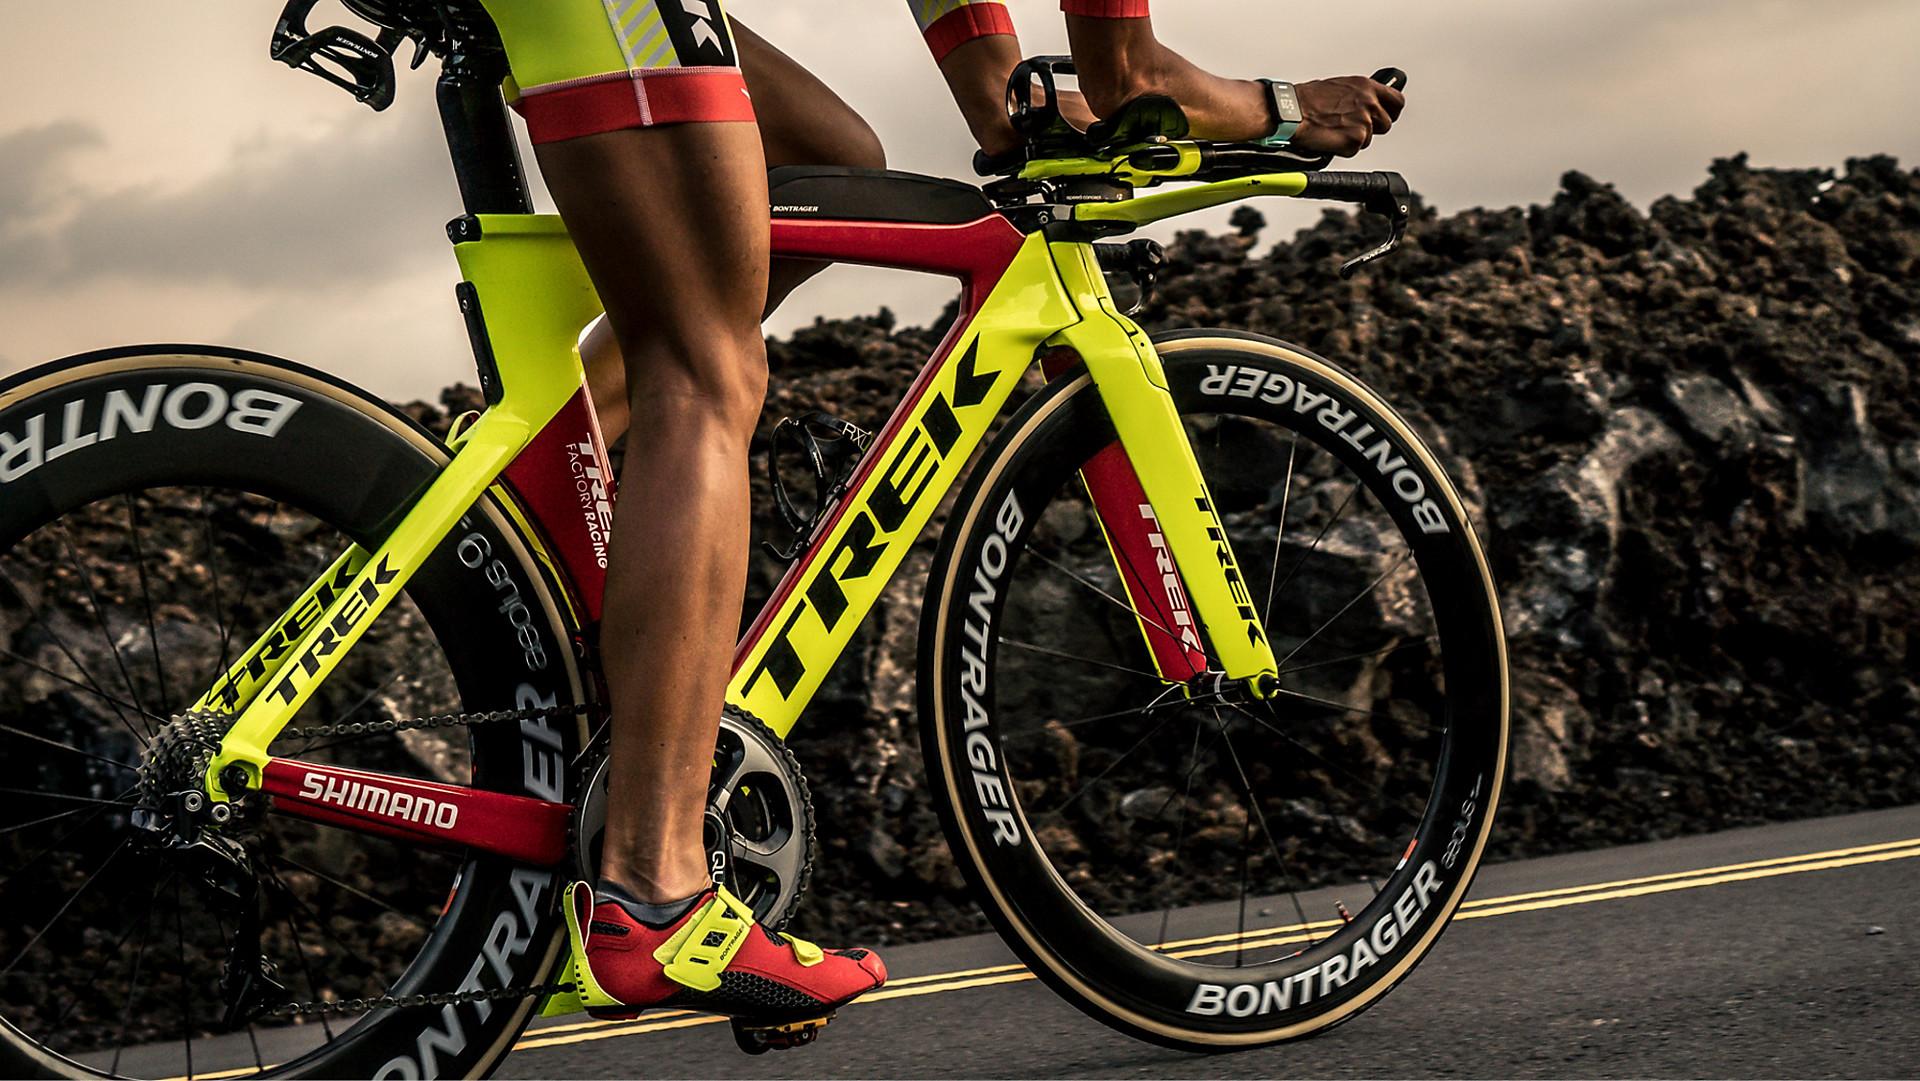 89456fcba4d8 Bici da triathlon | Trek Bikes (IT)